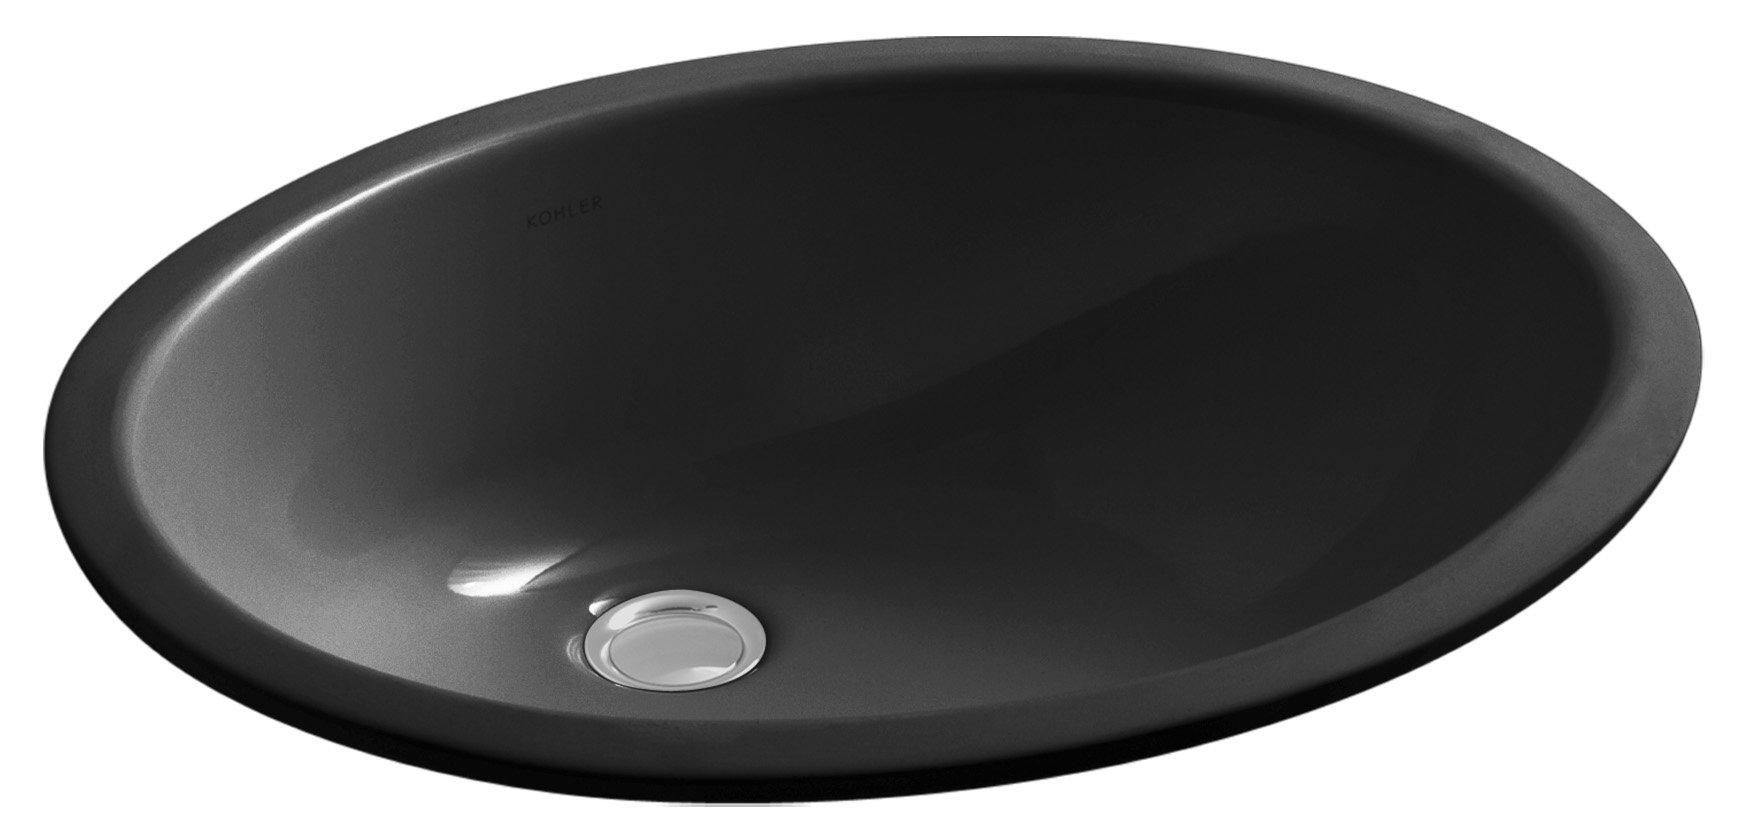 KOHLER K-2210-7 Caxton Undercounter Bathroom Sink, Black Black by Kohler